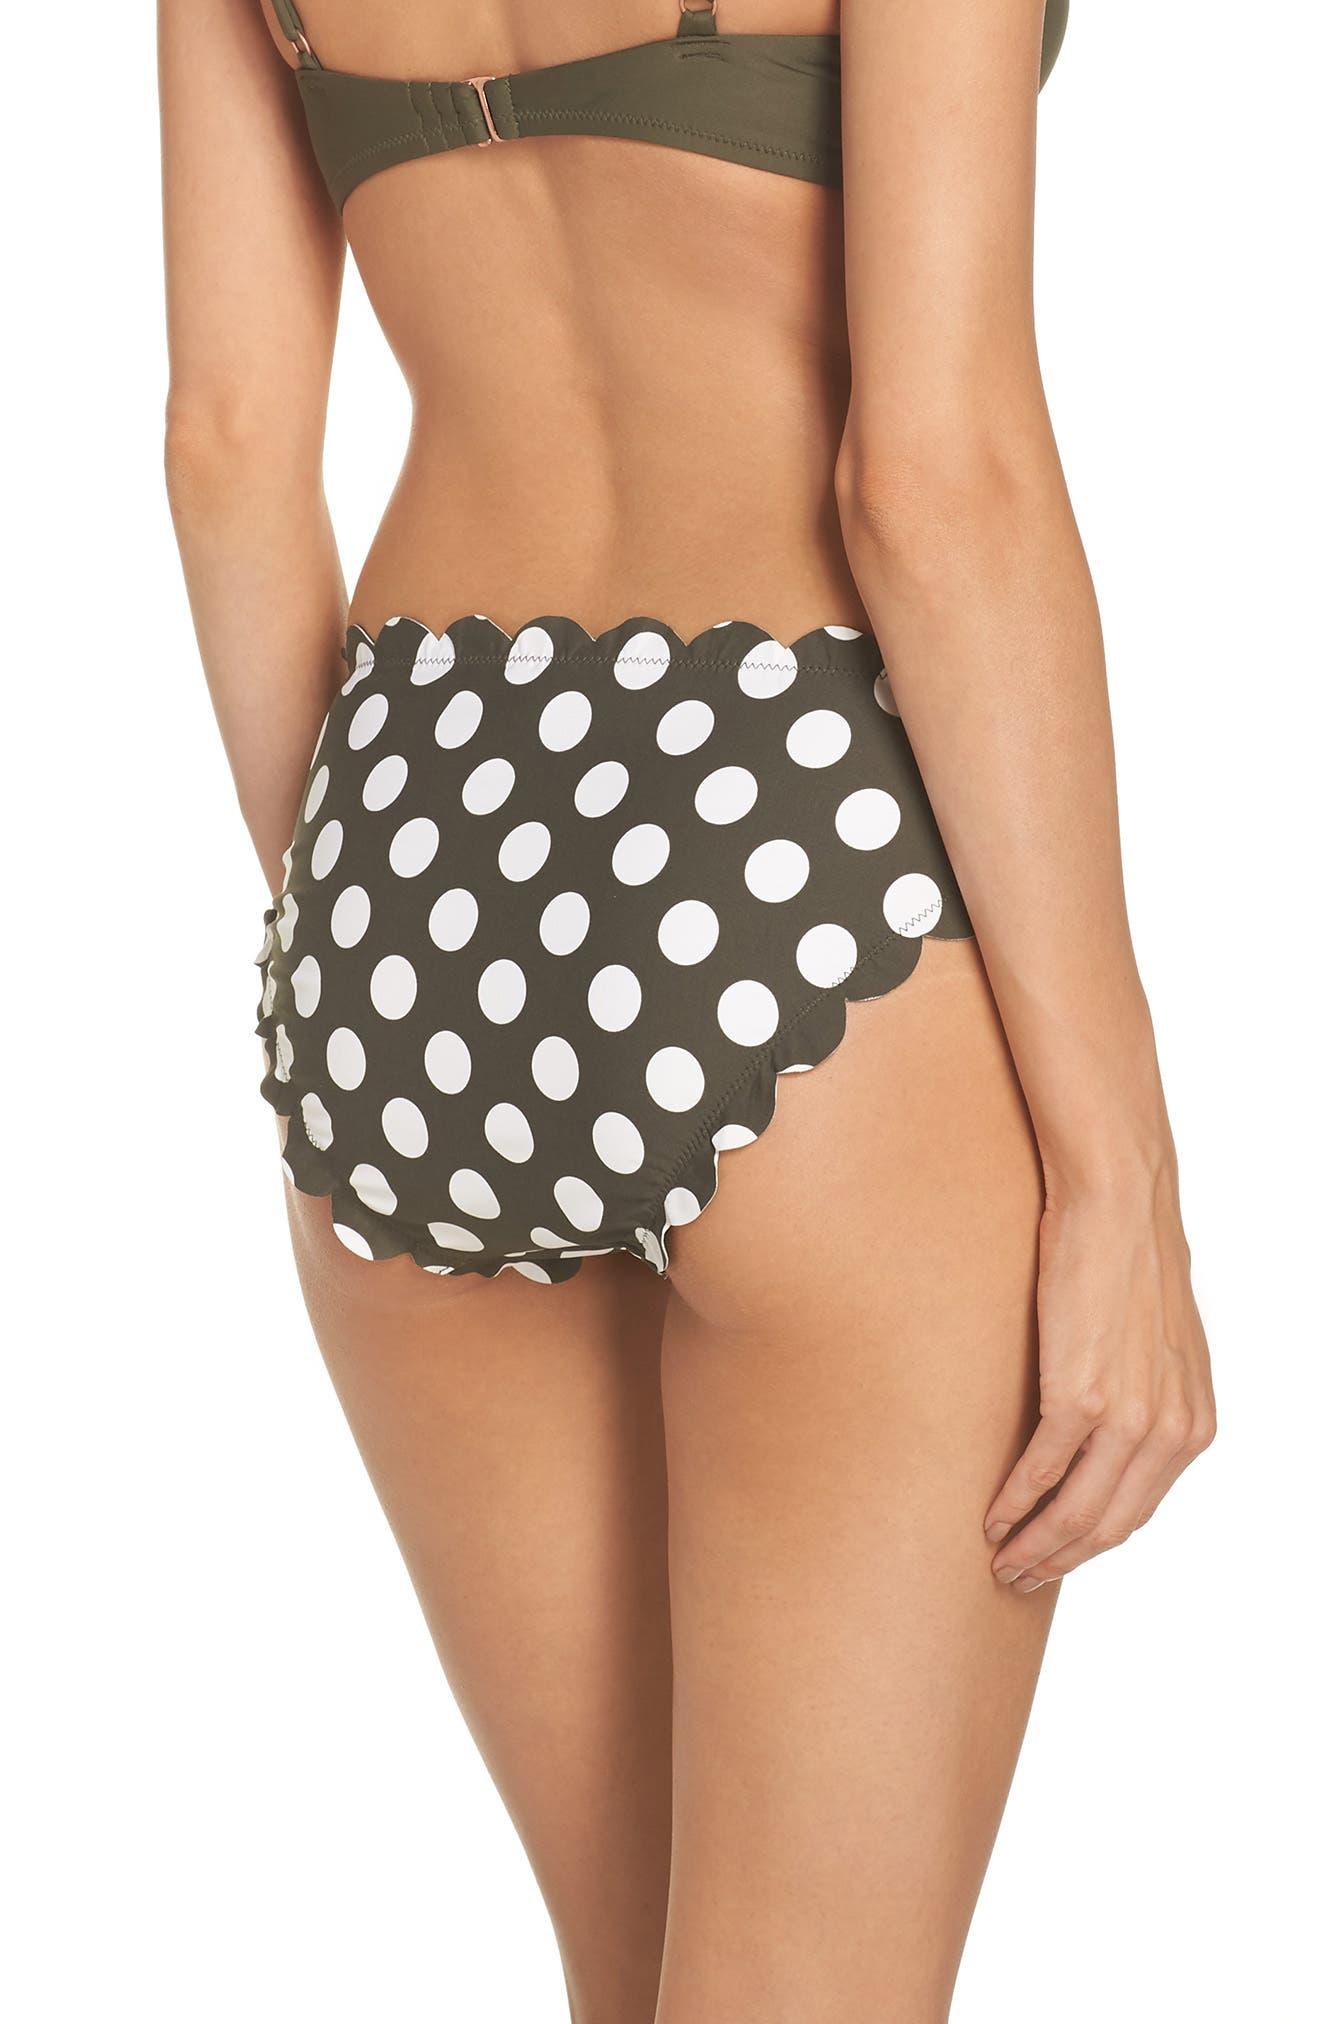 Scallop Hipster Bikini Bottoms,                             Alternate thumbnail 2, color,                             OLIVE SARMA/ IVORY EGRET DOT